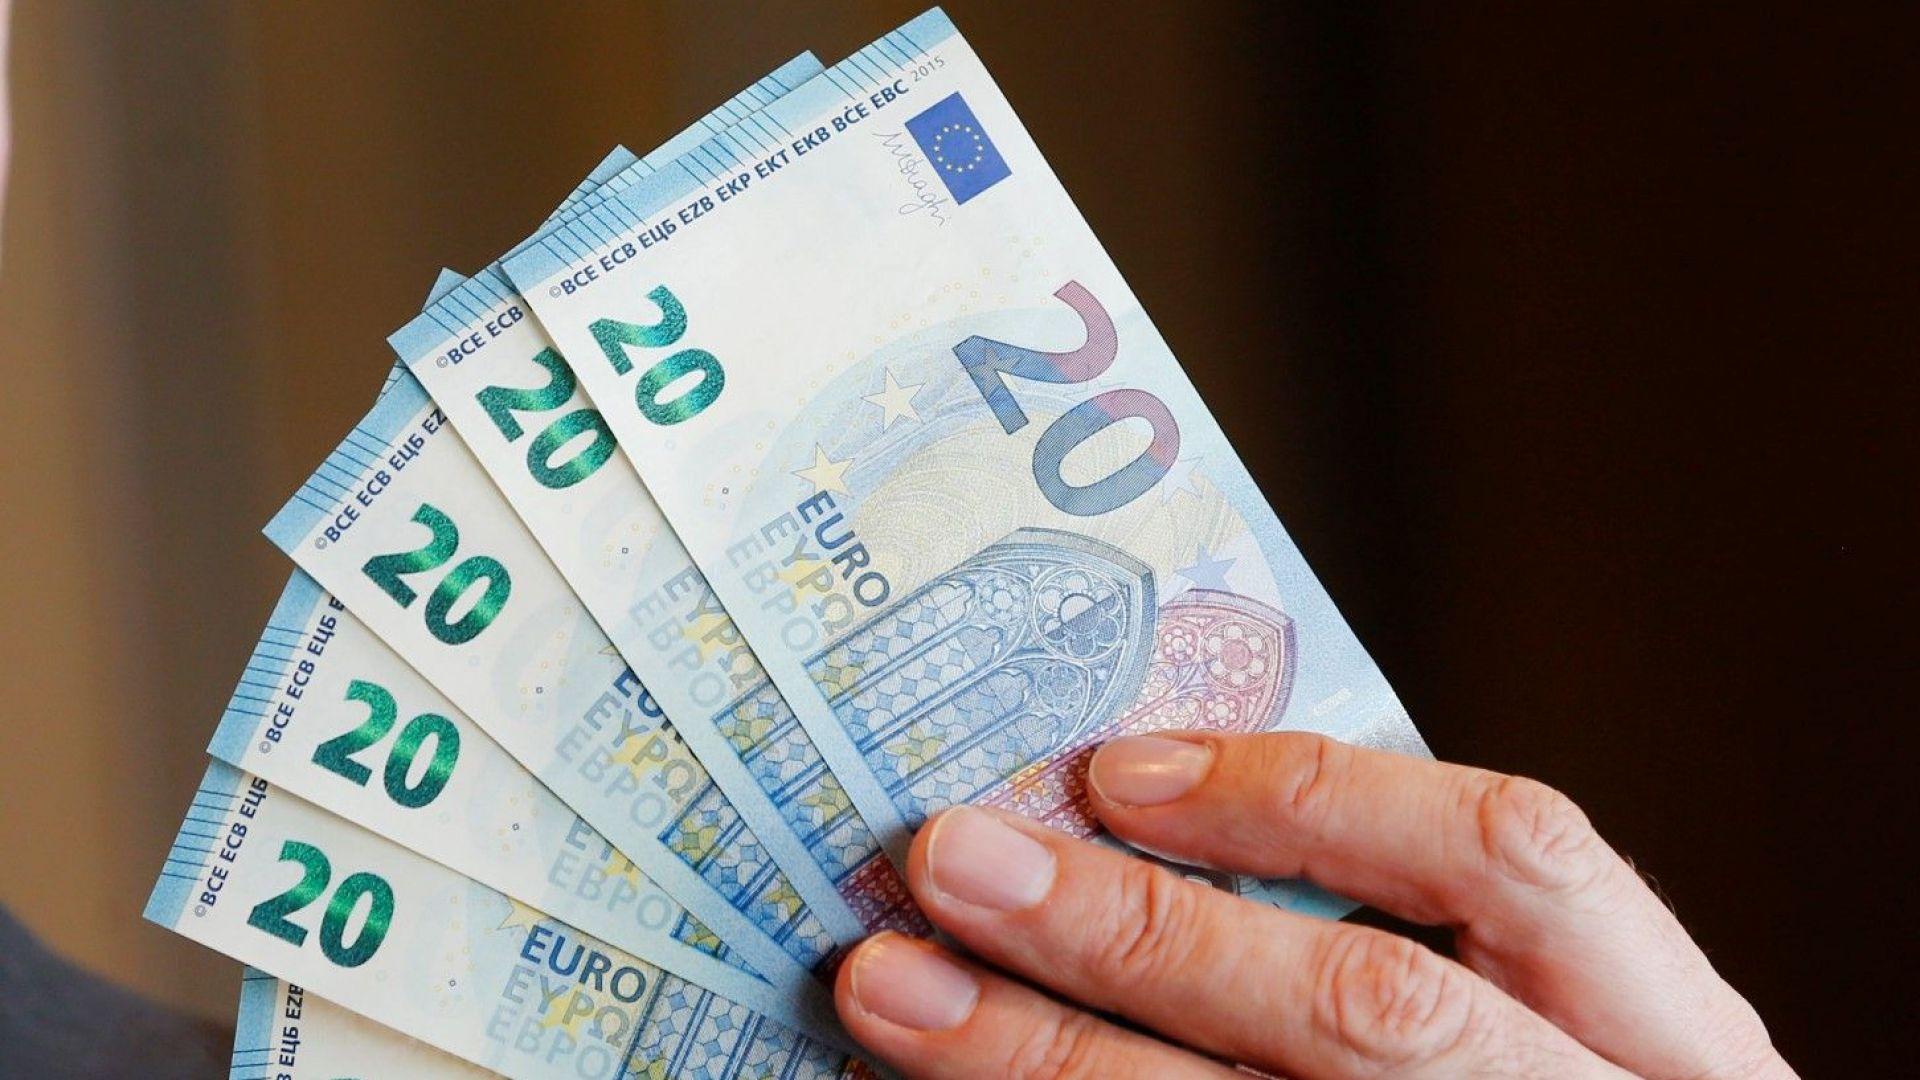 Асарел Медет изкупува обратно акции за 100 млн. лв.